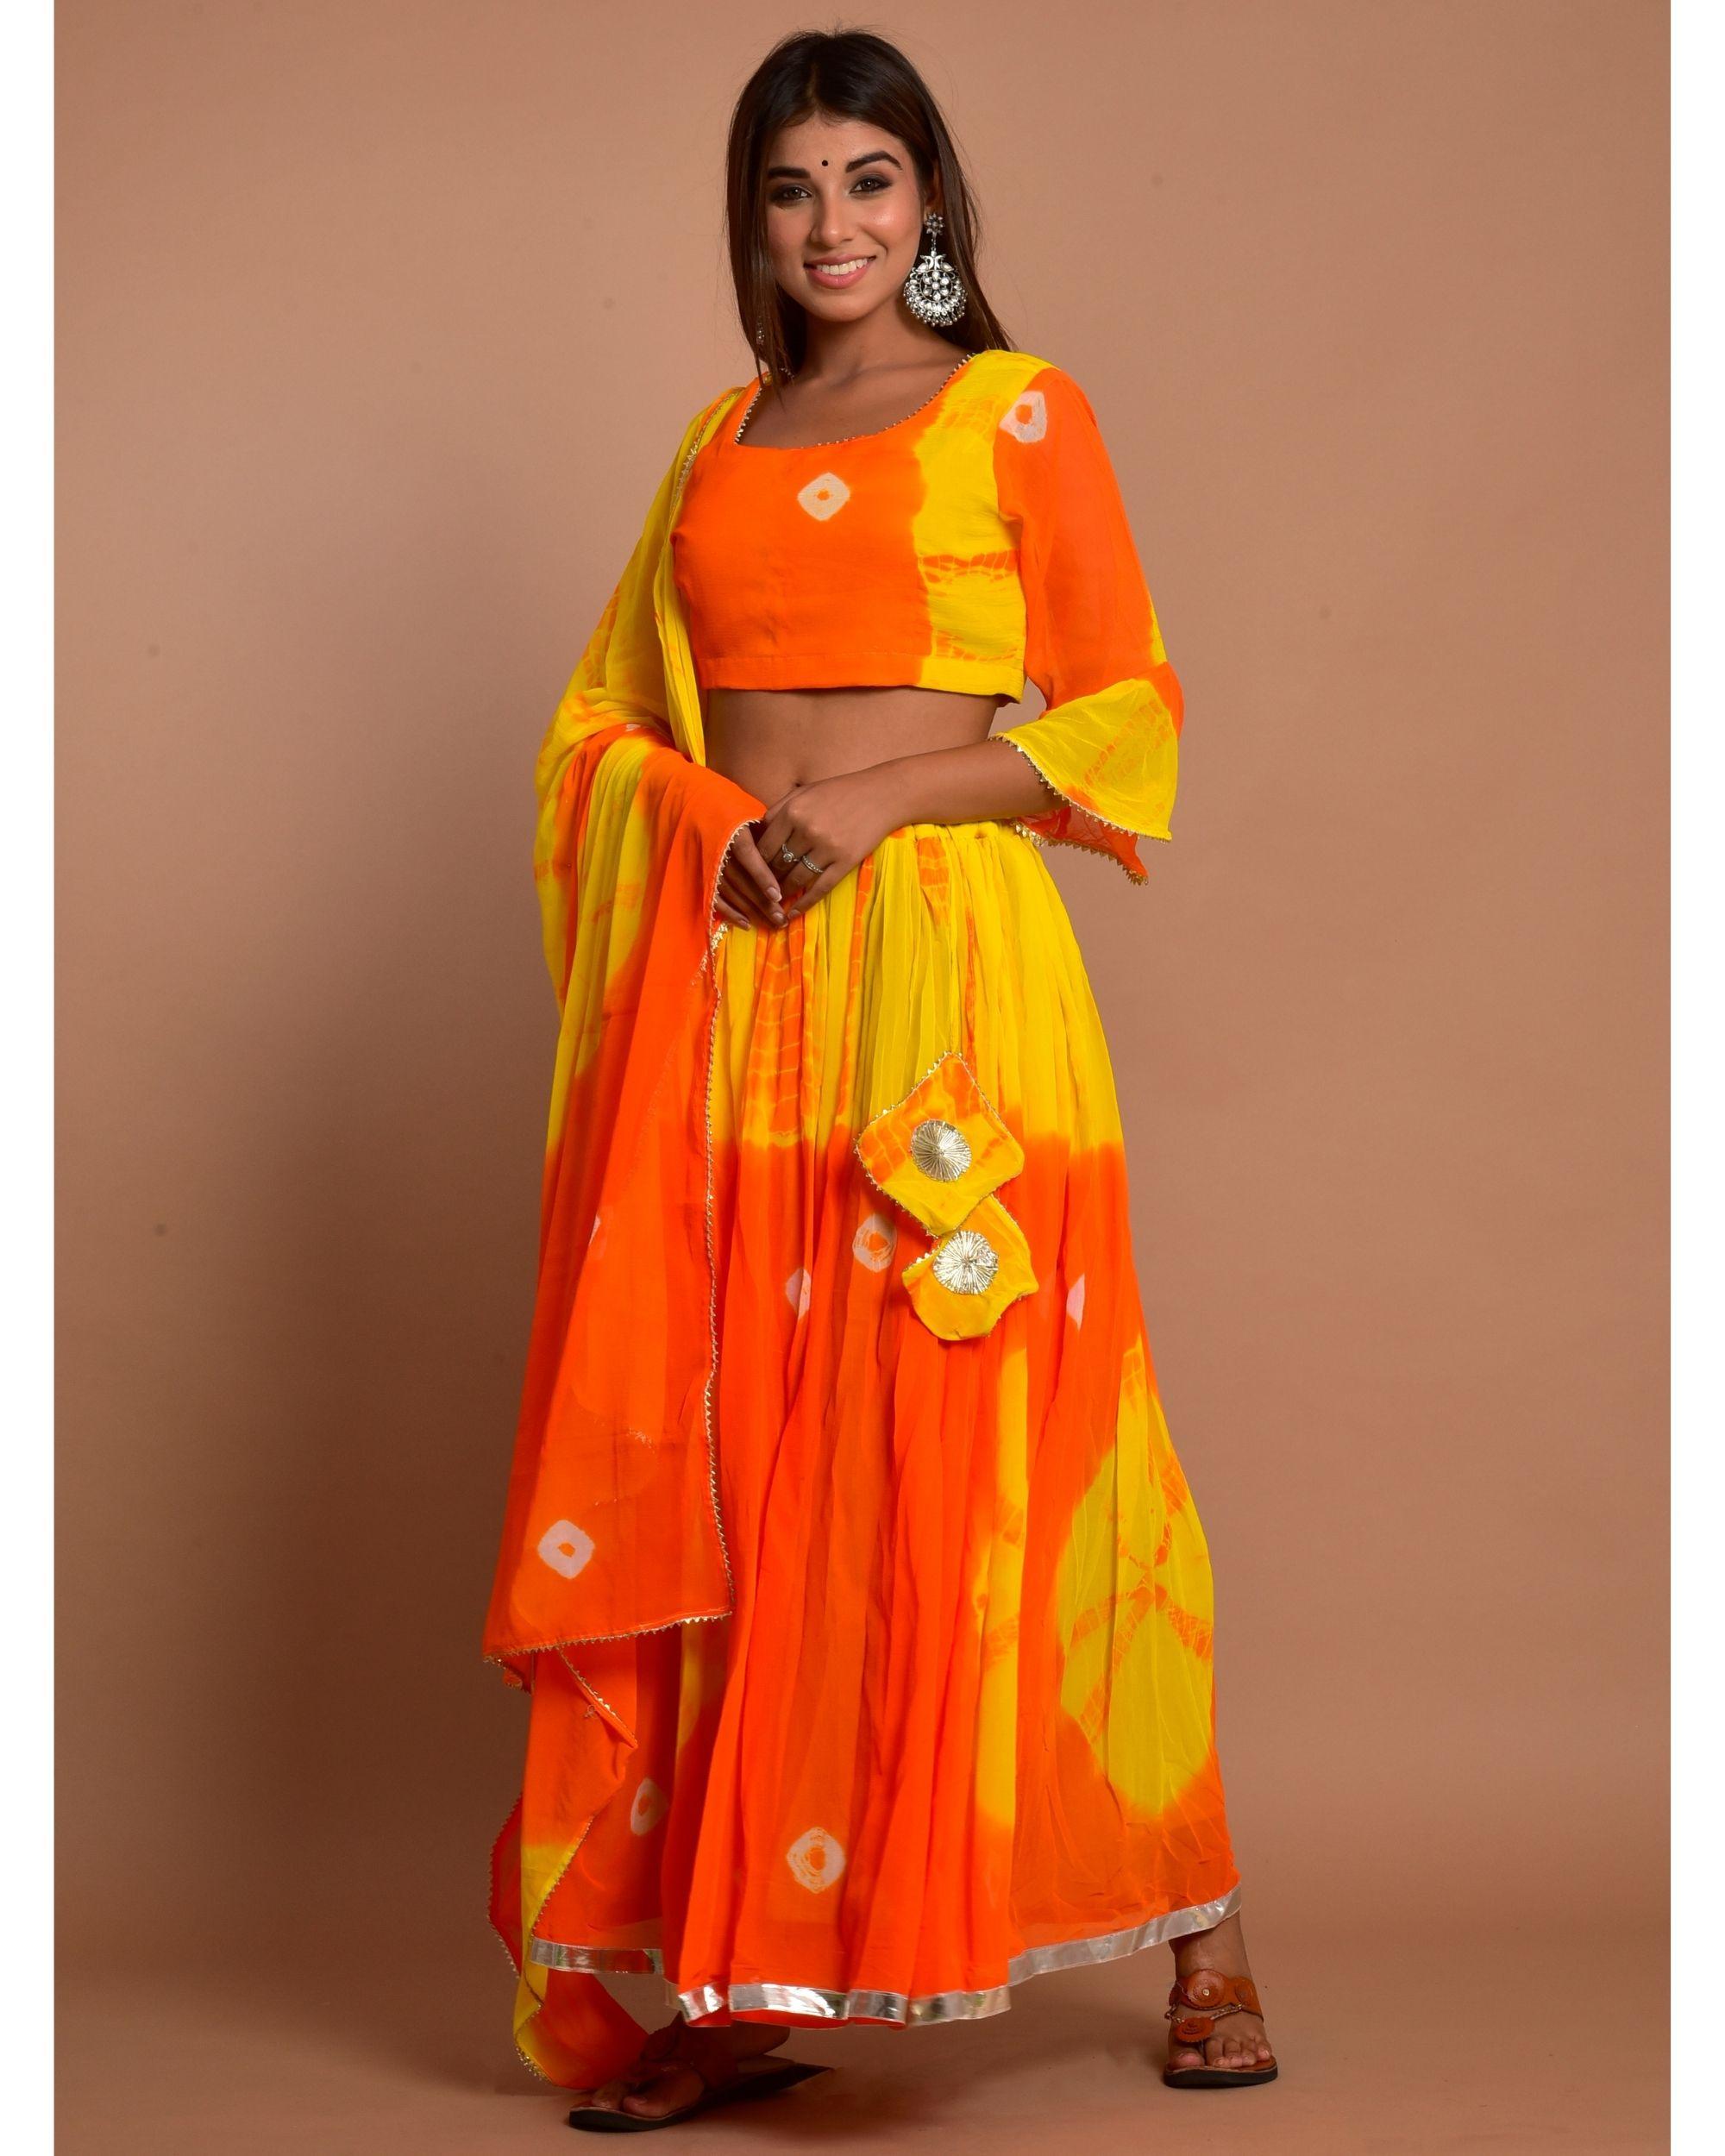 Orange and yellow tie and dye choli and lehenga with dupatta - Set Of Three